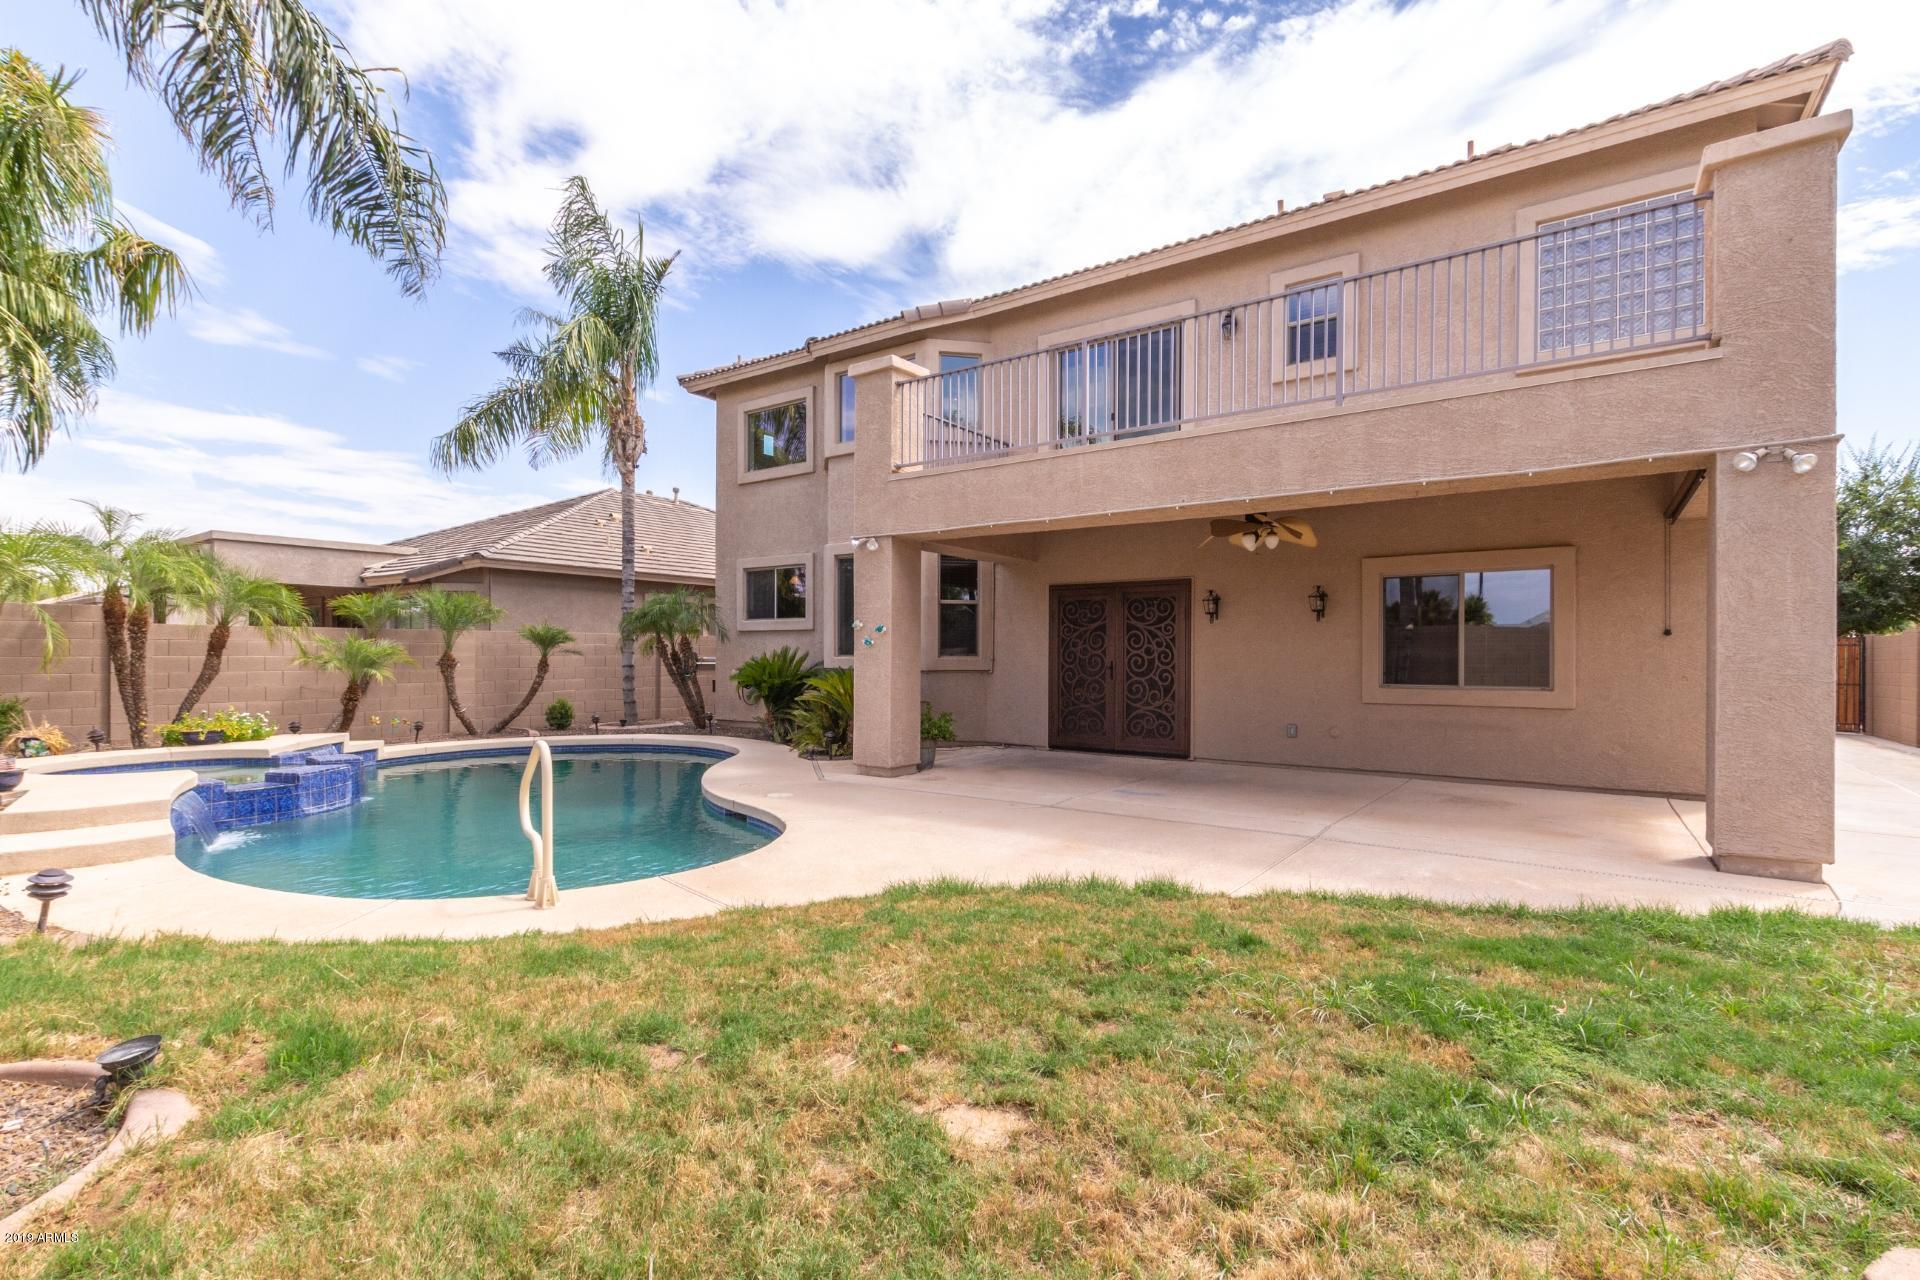 MLS 5952127 14956 W POINSETTIA Drive, Surprise, AZ 85379 Surprise AZ Rancho Gabriela